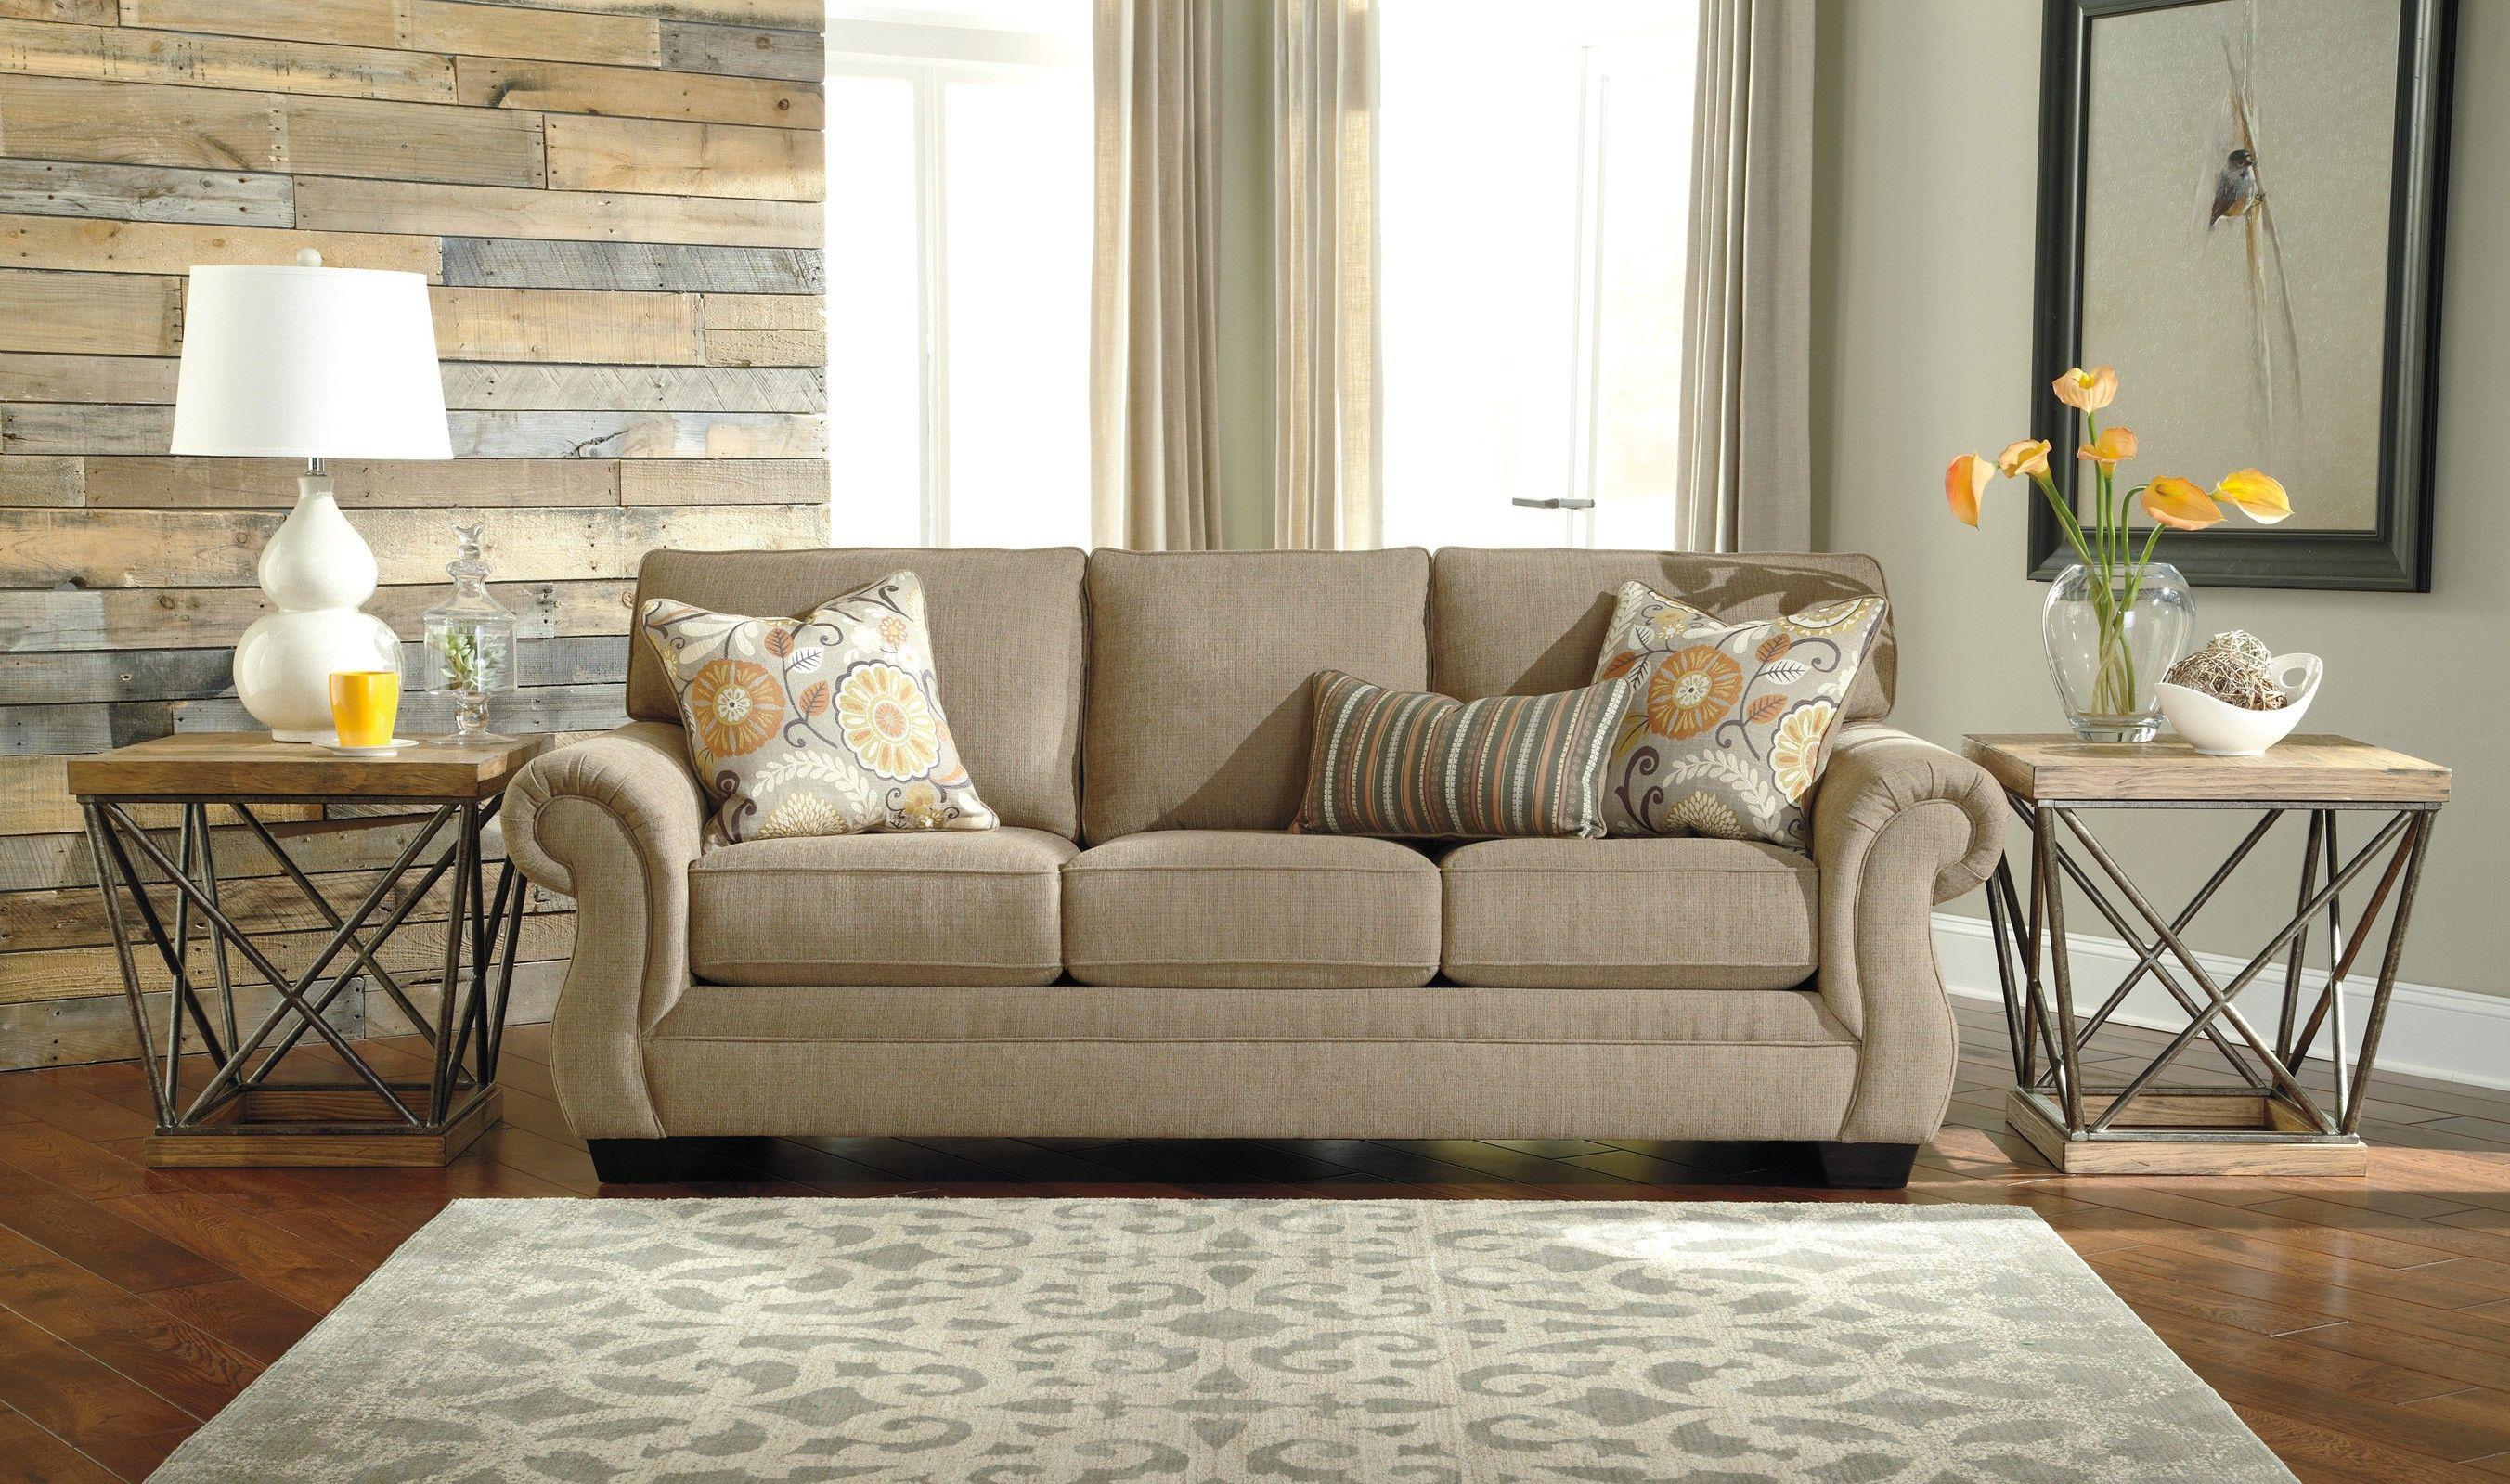 Tailya Barley Sofa For 549 94 Furniture At Home Furniture Store Decor